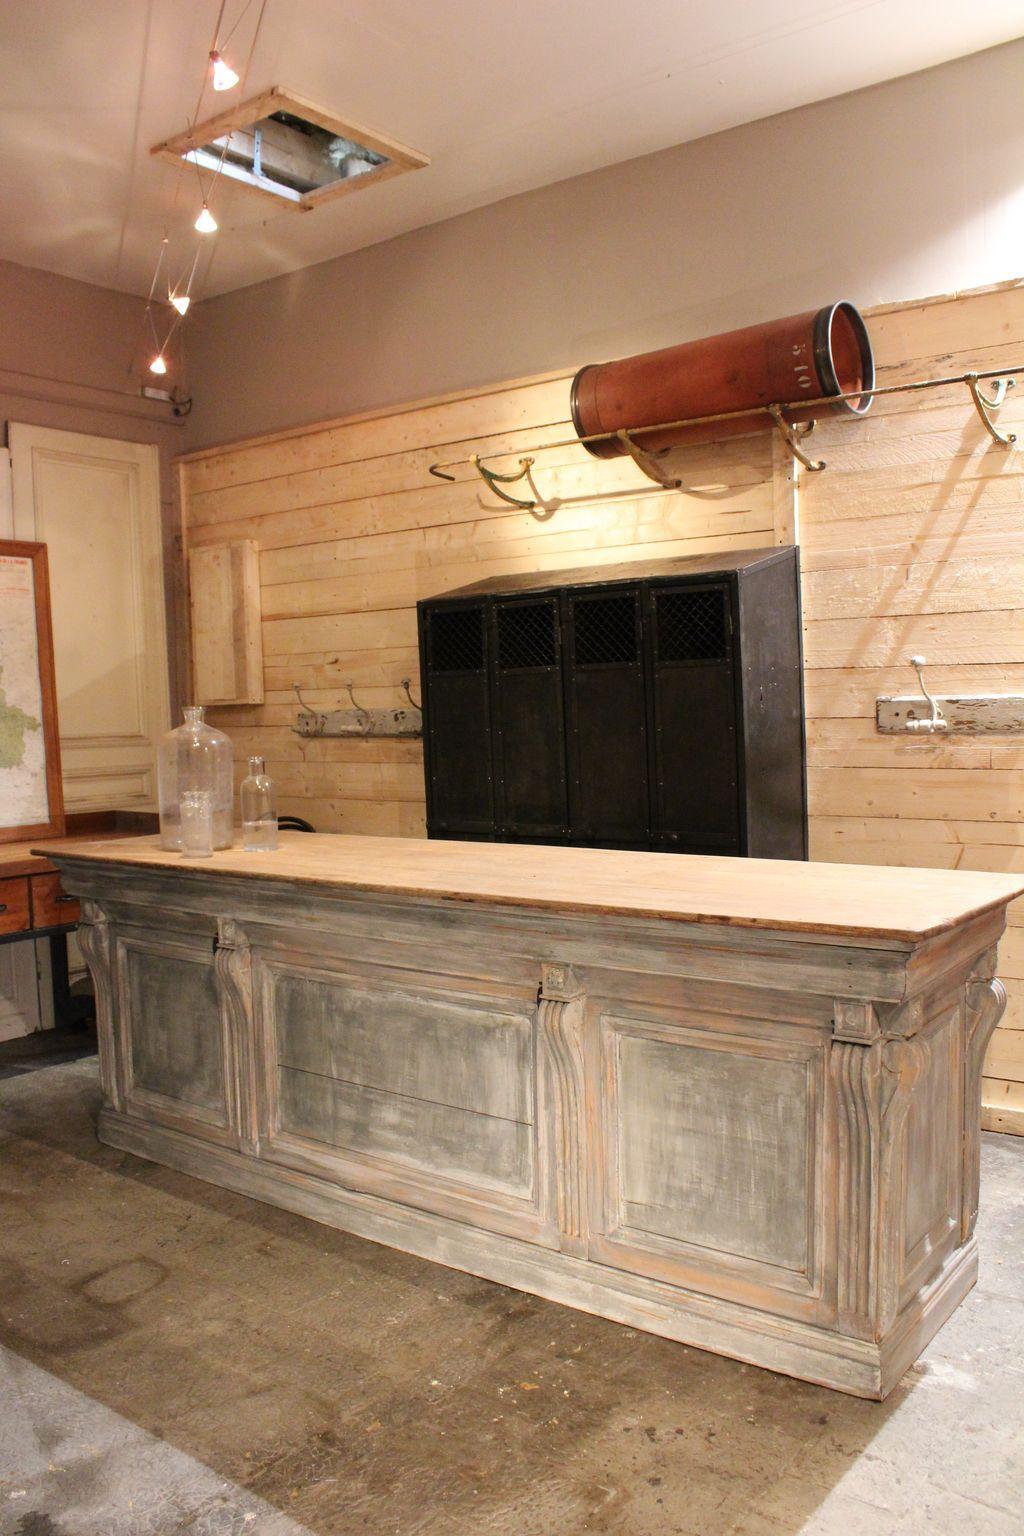 mobilier industriel counter trade ma petite boutique pinterest industriel mobilier et. Black Bedroom Furniture Sets. Home Design Ideas